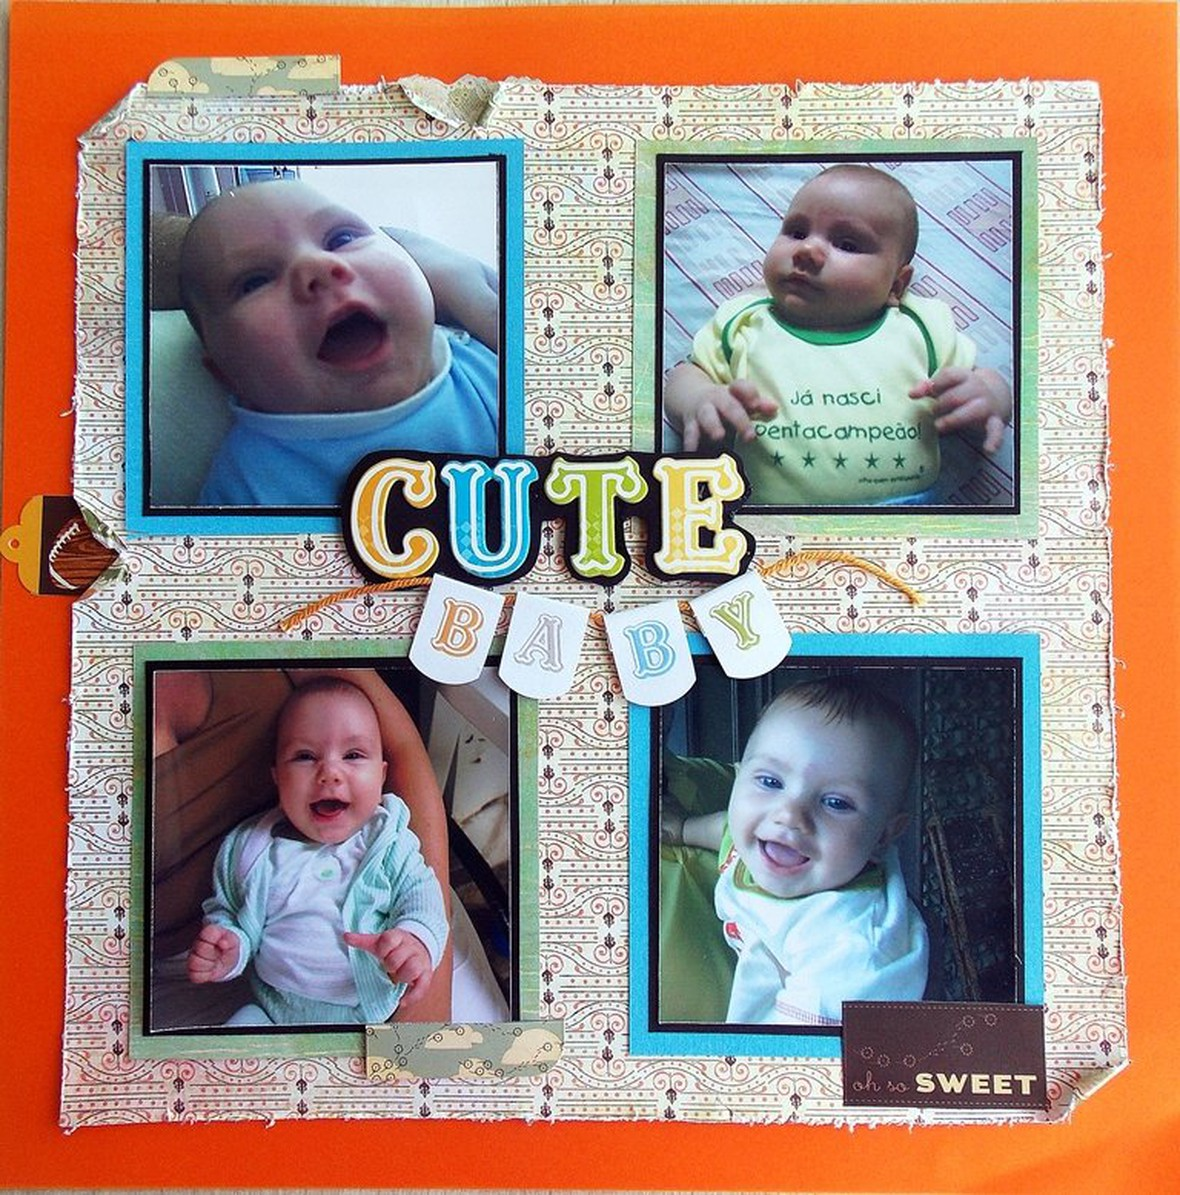 Cute baby menor original